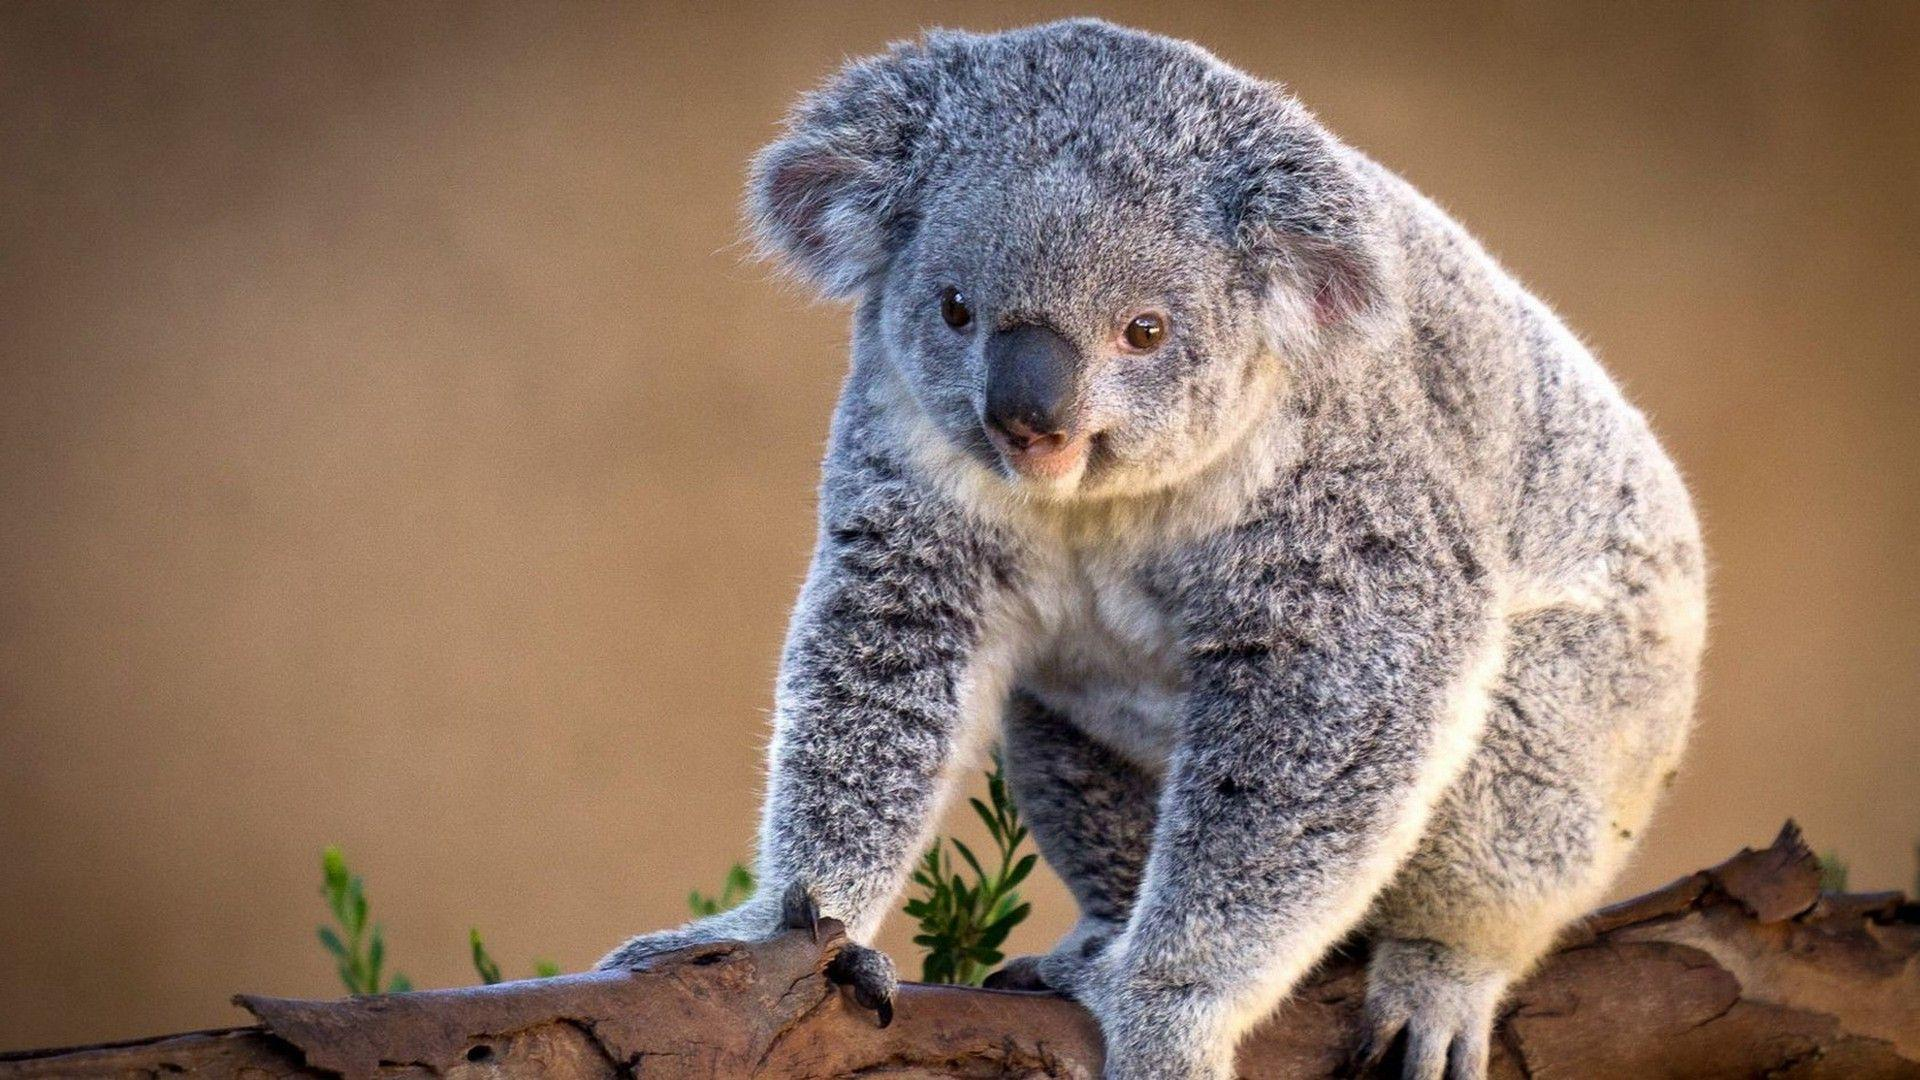 Koala Wallpaper 12955